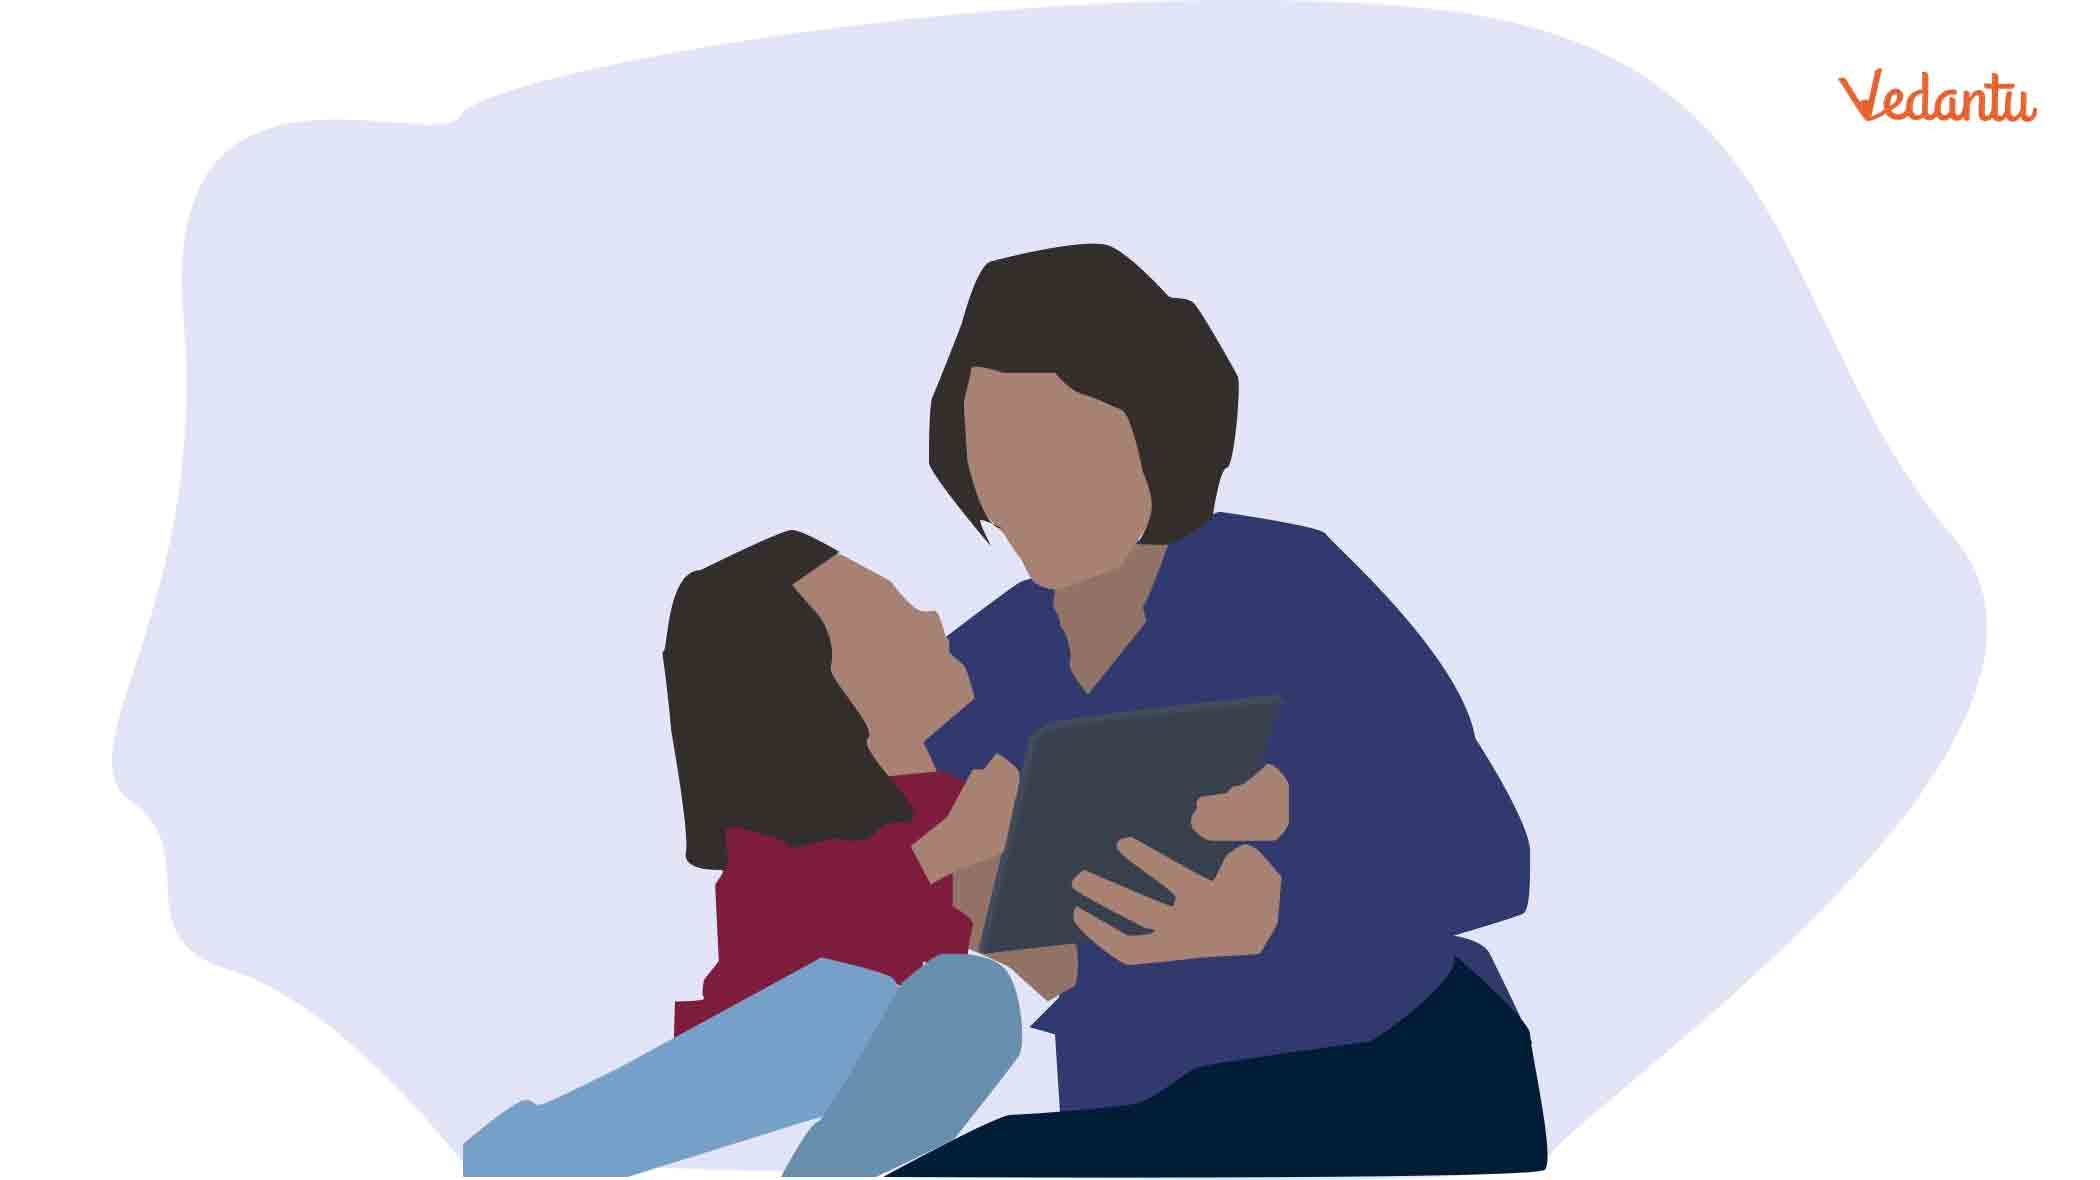 Parents Beware! Don't Let Misinformation Harm Your Children During the Coronavirus Pandemic